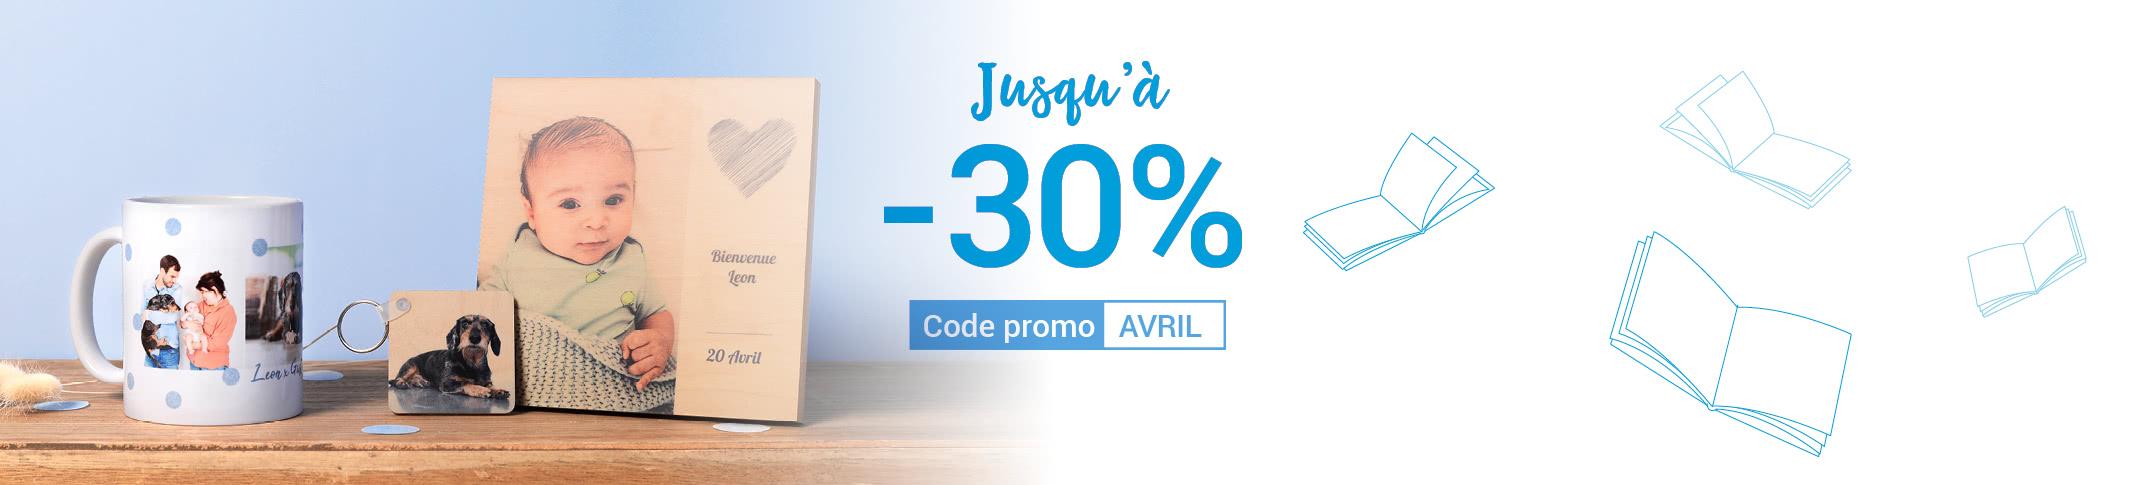 Code promo smartphoto.fr avril 2021